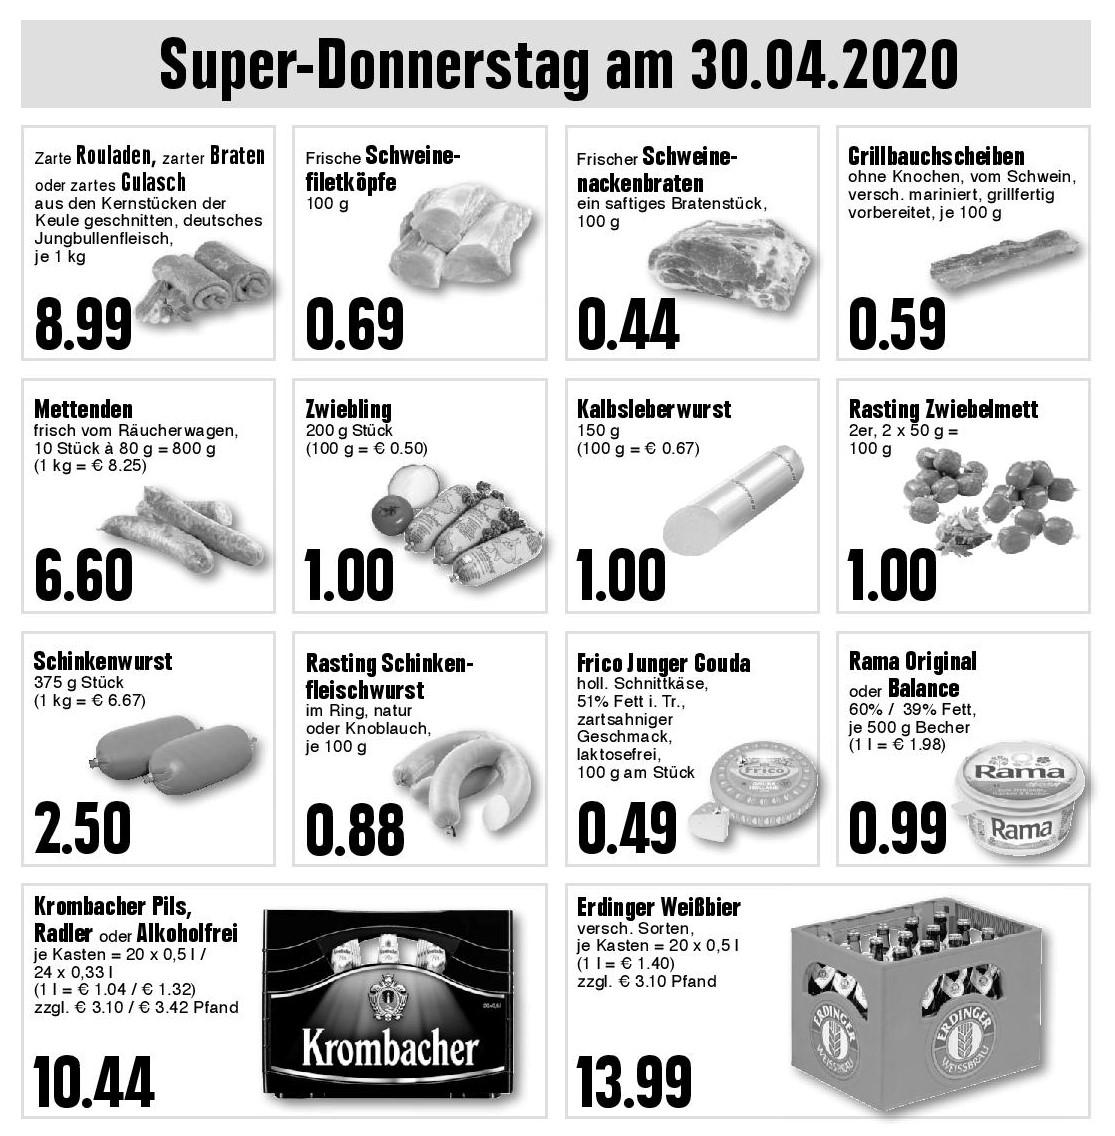 Super-Donnerstag am 30.04.2020